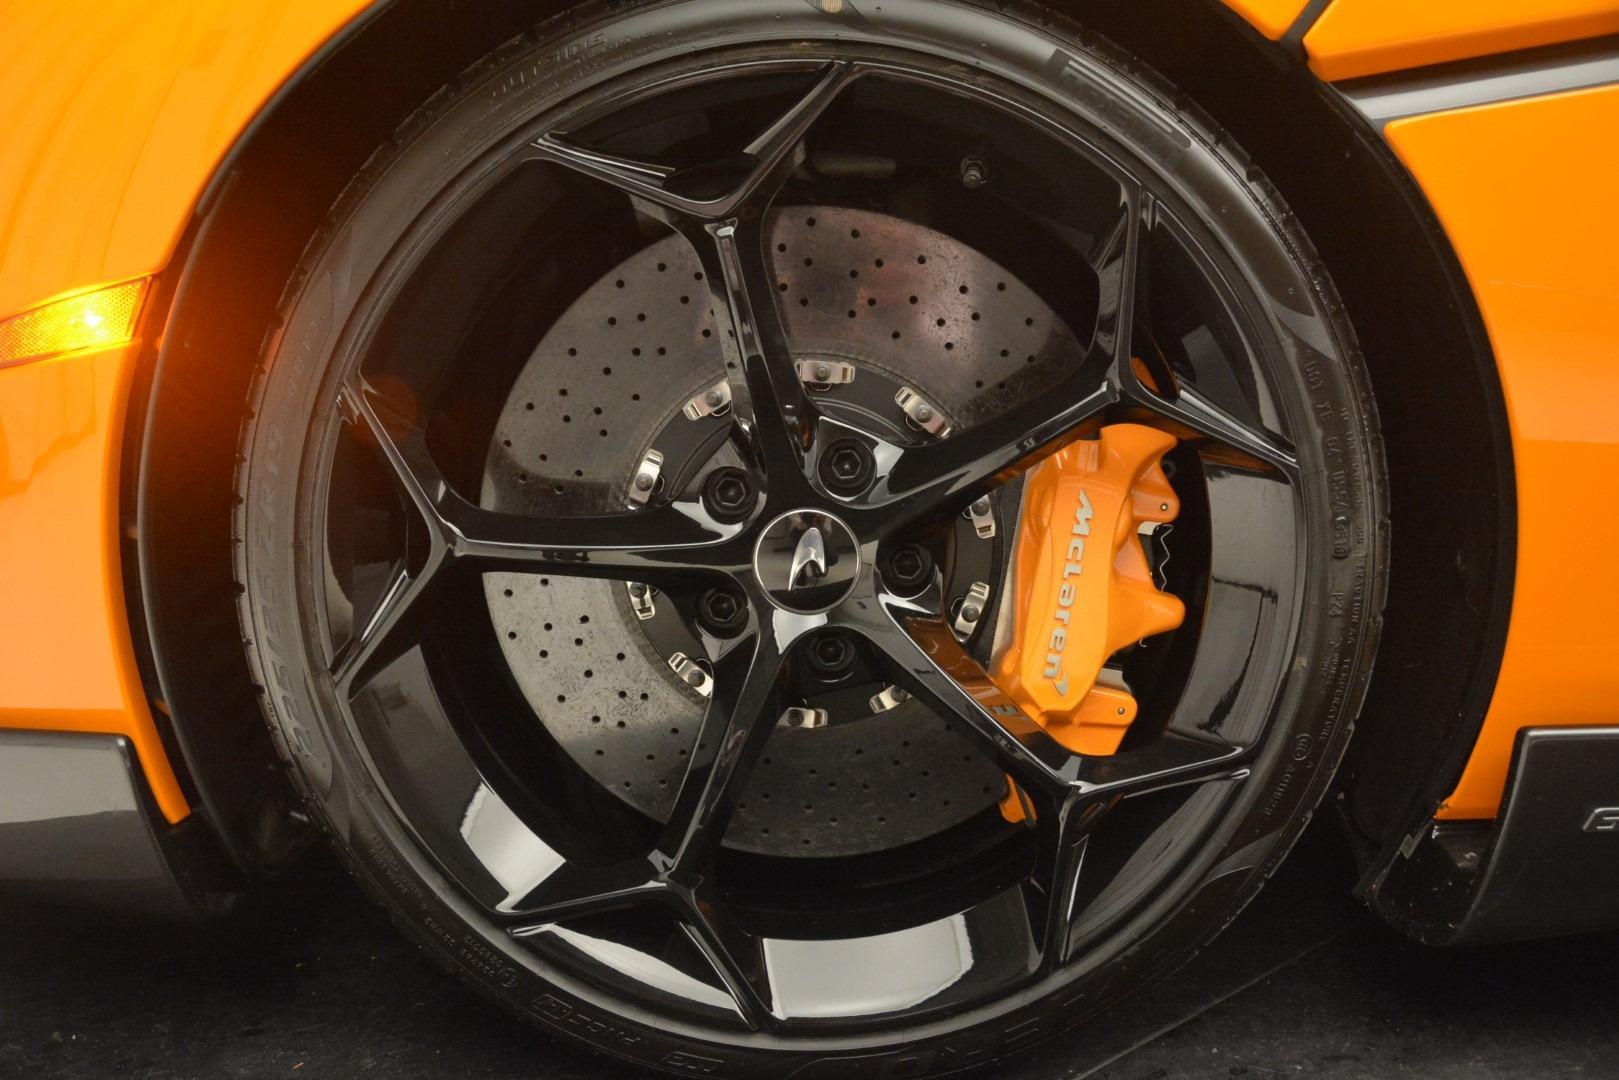 New 2020 McLaren 600LT Spider Convertible For Sale 280200 In Greenwich, CT